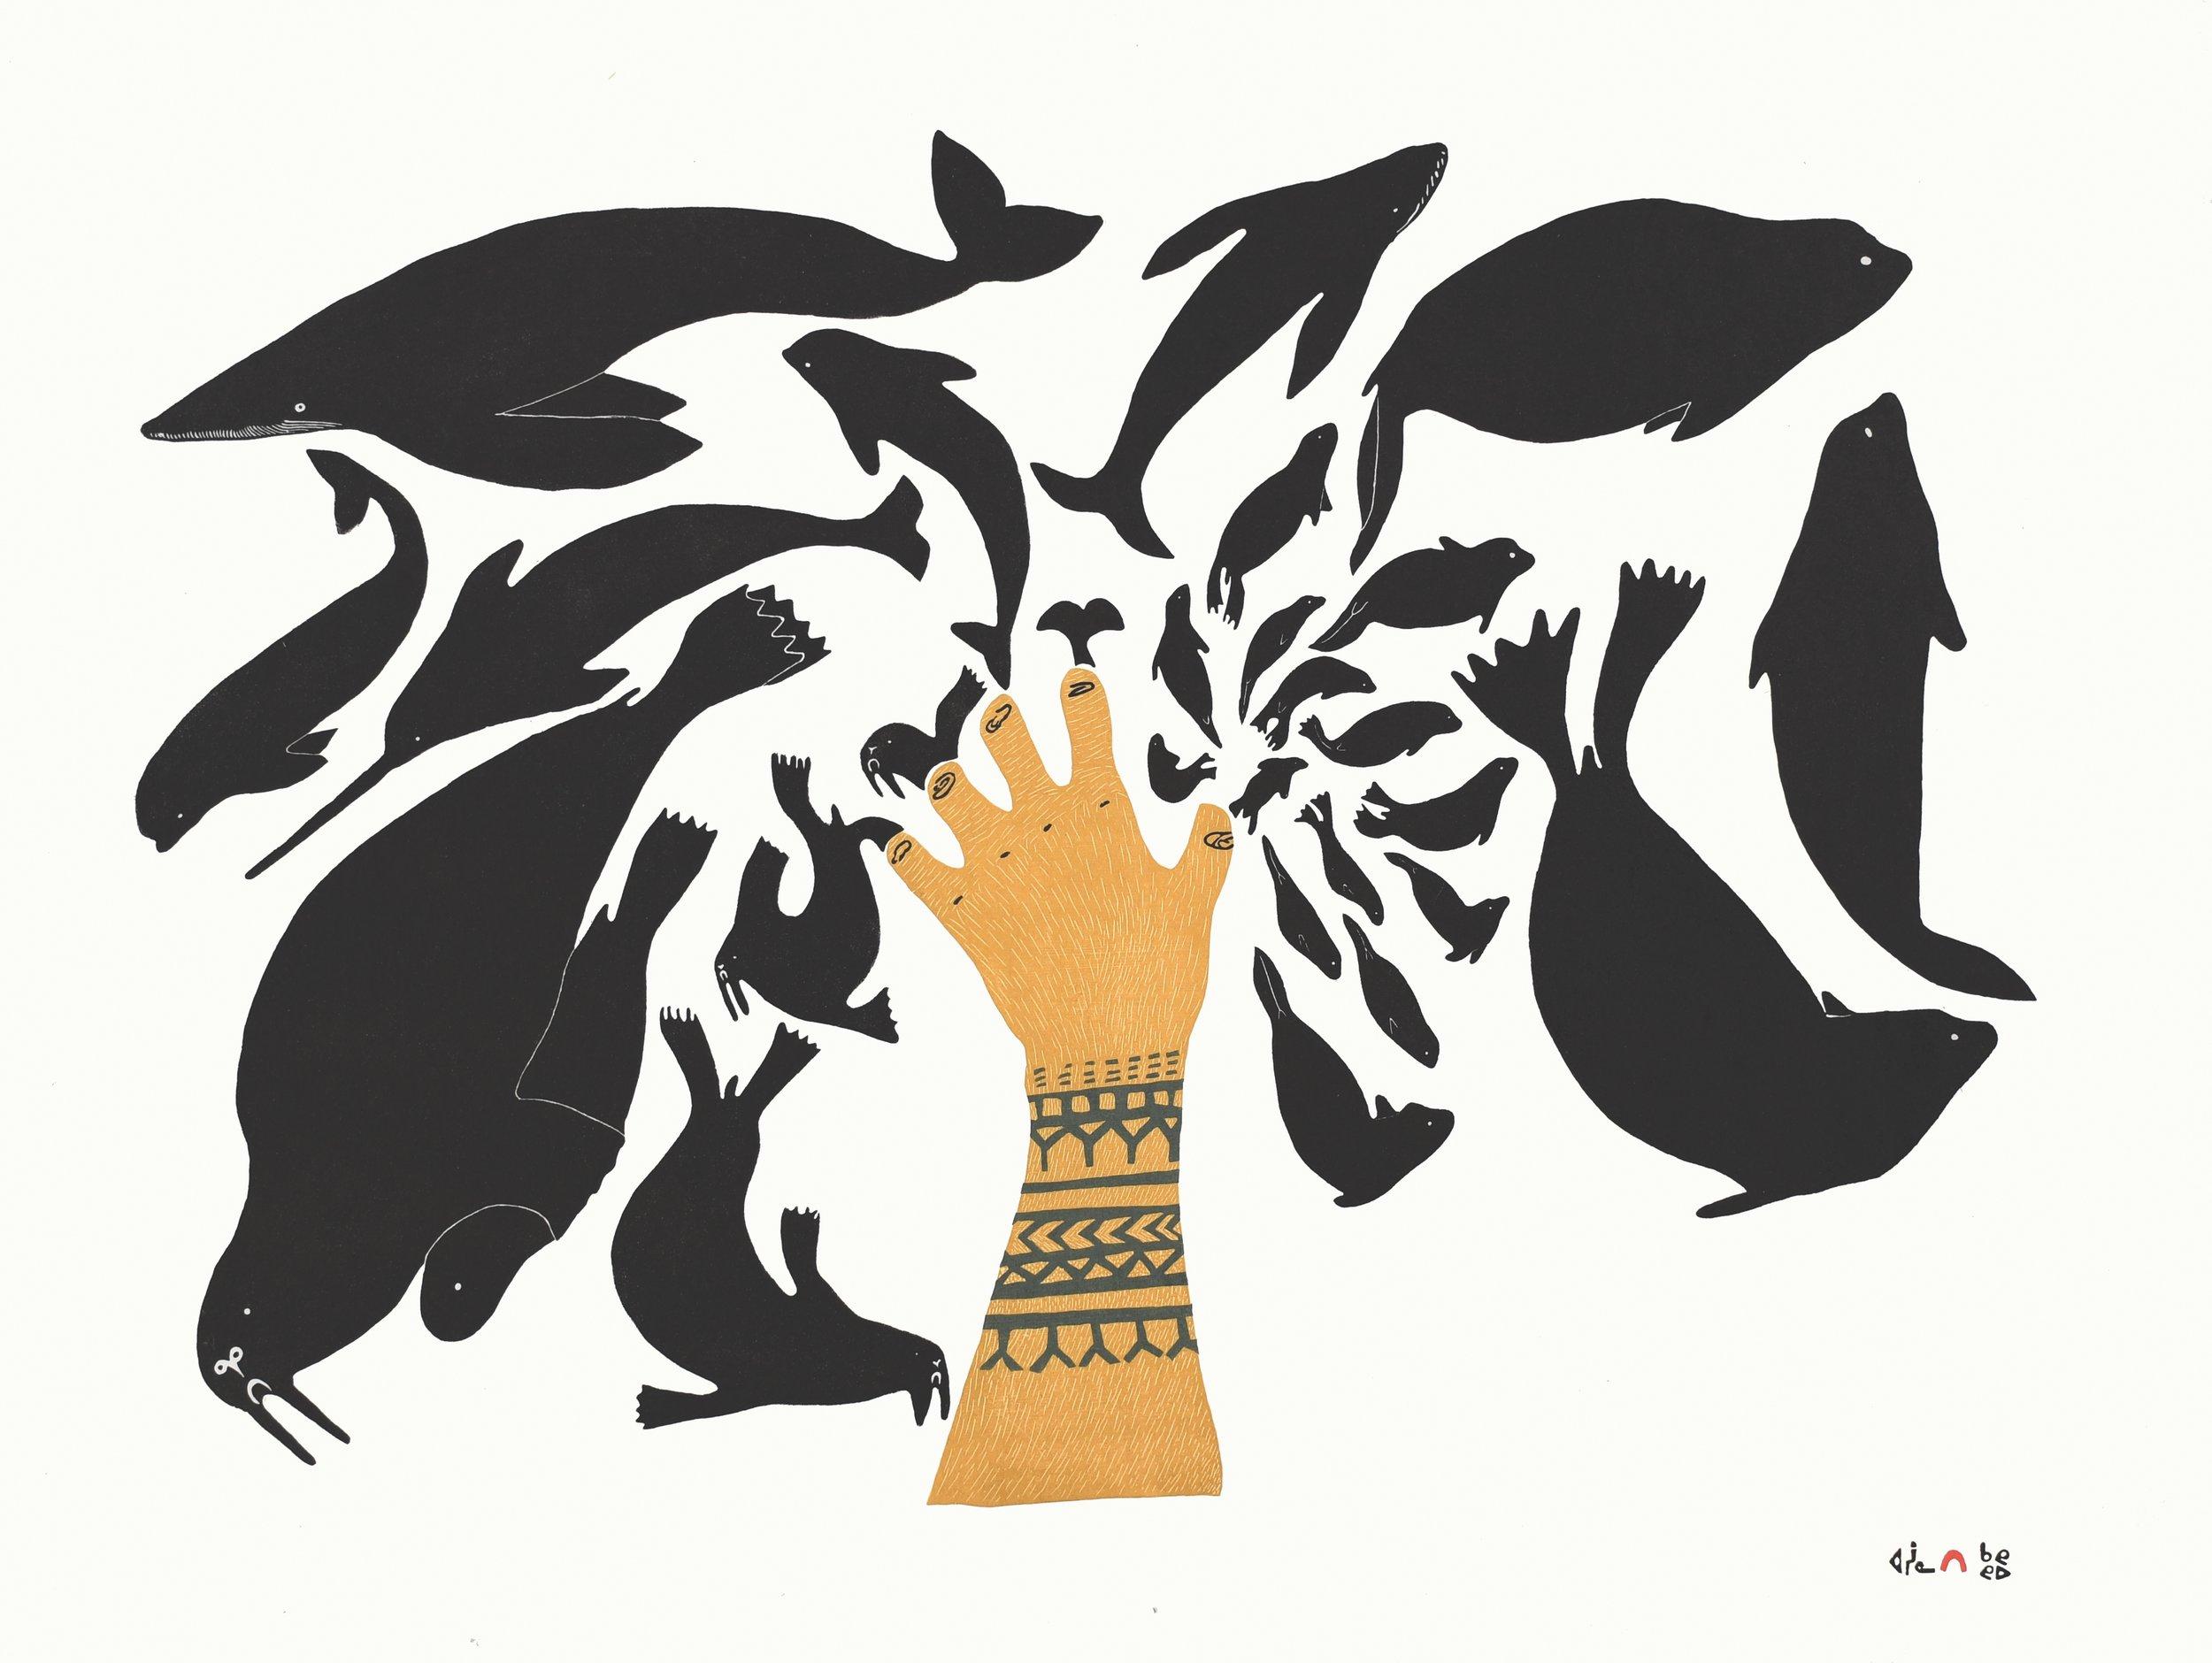 NINGIUKULU TEEVEE  4. Sedna's Creation  Stonecut  Paper: Kizuki Kozo White  Printer: Qavavau Manumie & Ashoona Ashoona  61.5 x 81.8 cm  $ 1000